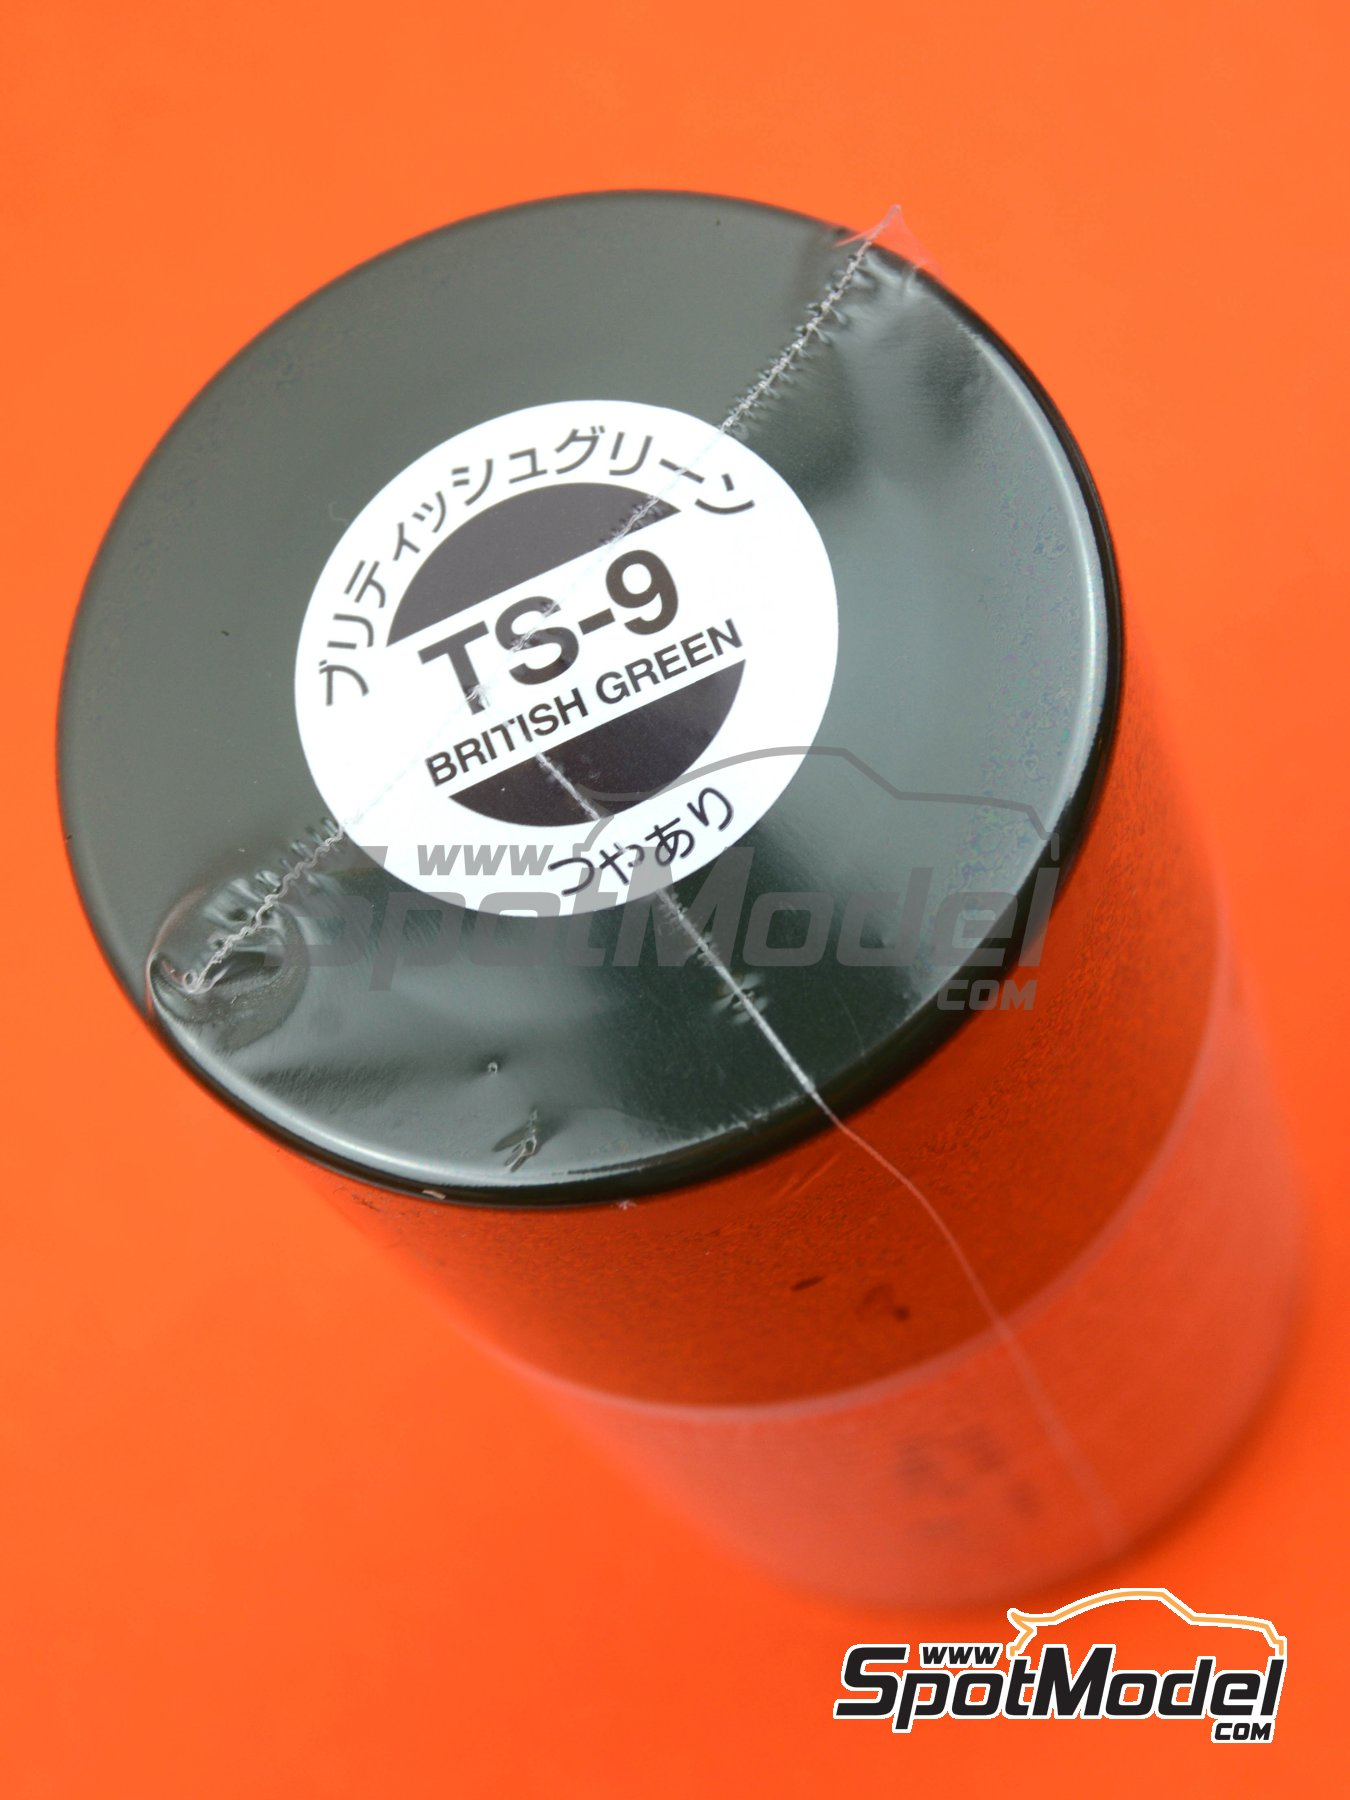 British green - TS-9 | Spray manufactured by Tamiya (ref.TAM85009, also 85009, TS9 and TS-9) image